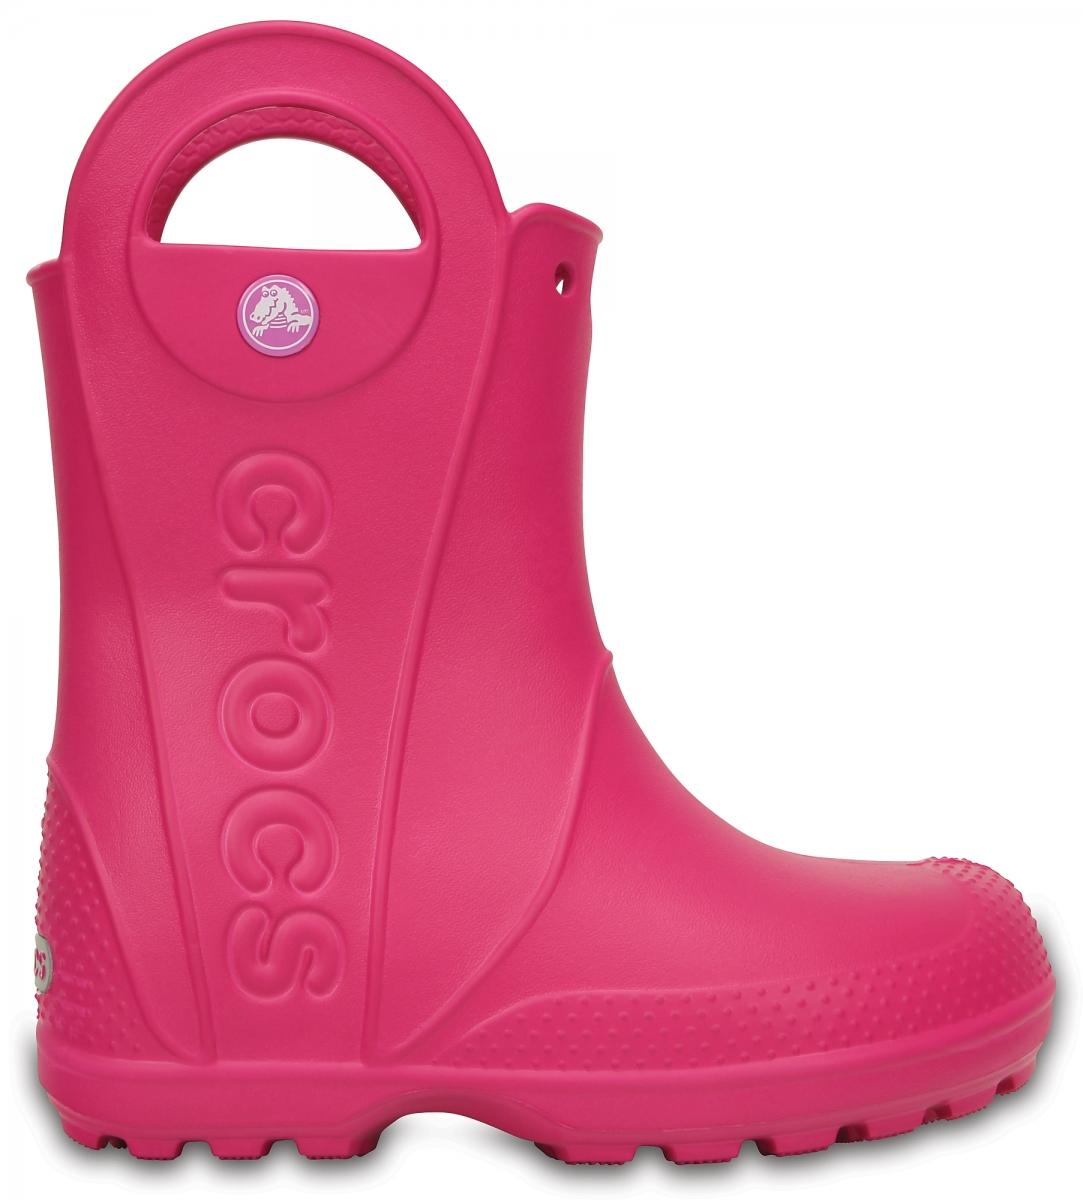 Crocs Handle It Rain Boot Kids - Candy Pink, C11 (28-29)